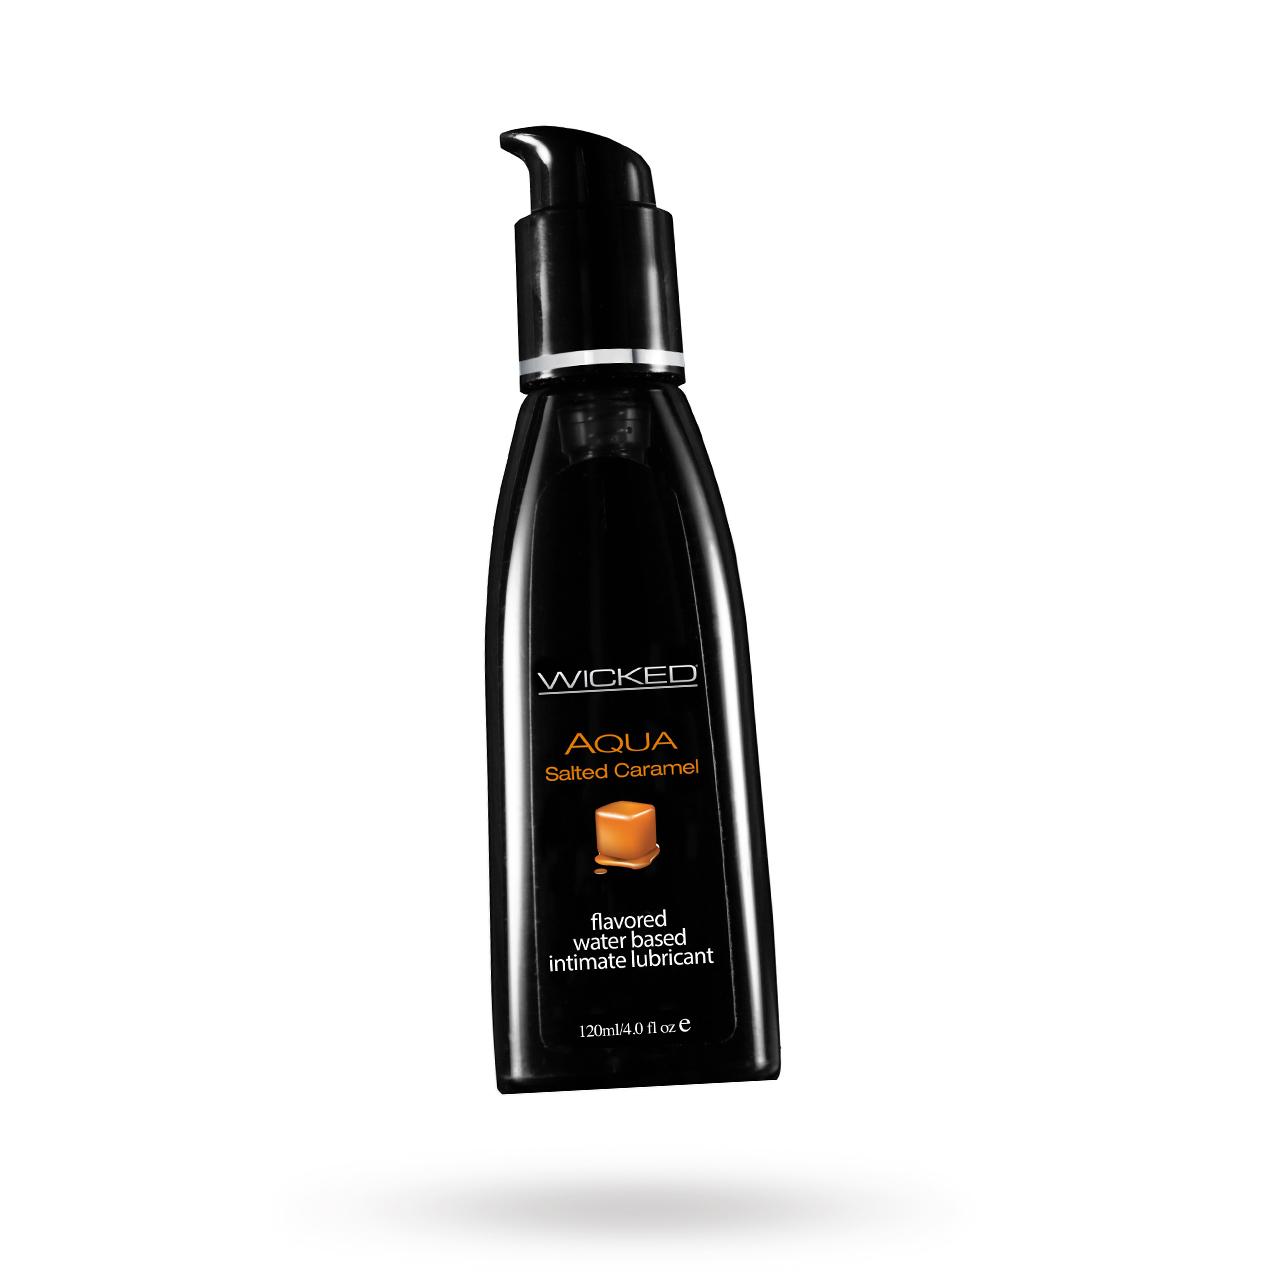 AQUA Salted Caramel | Brands, Wicked Sensual Care, GLIDMEDEL ETC., GLIDMEDEL, Vattenbaserade glidmedel | Intimast.se - Sexleksaker